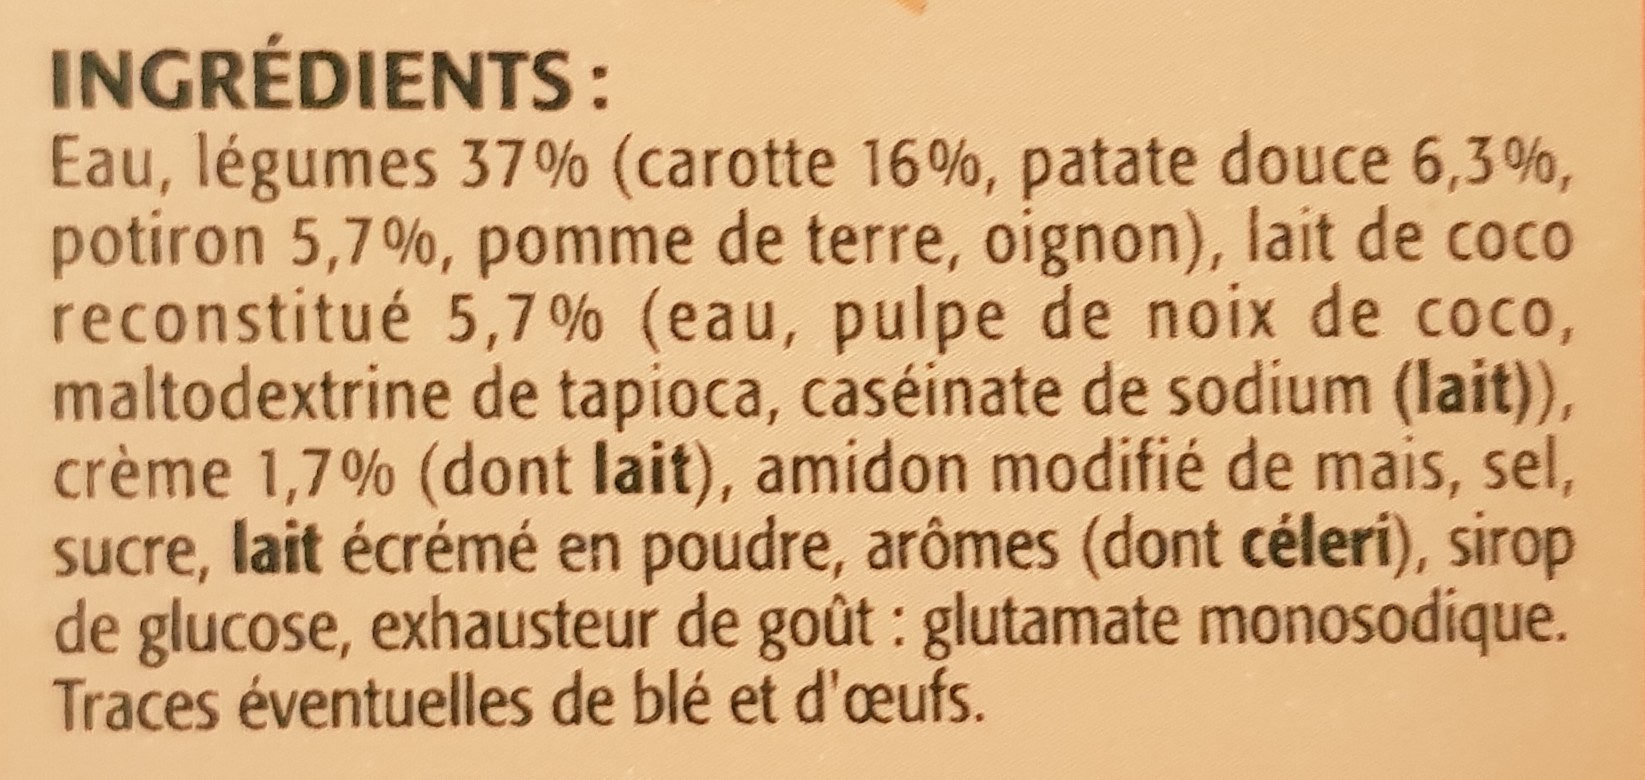 Velouté Carotte Potiron Patate douce - Ingrediënten - fr